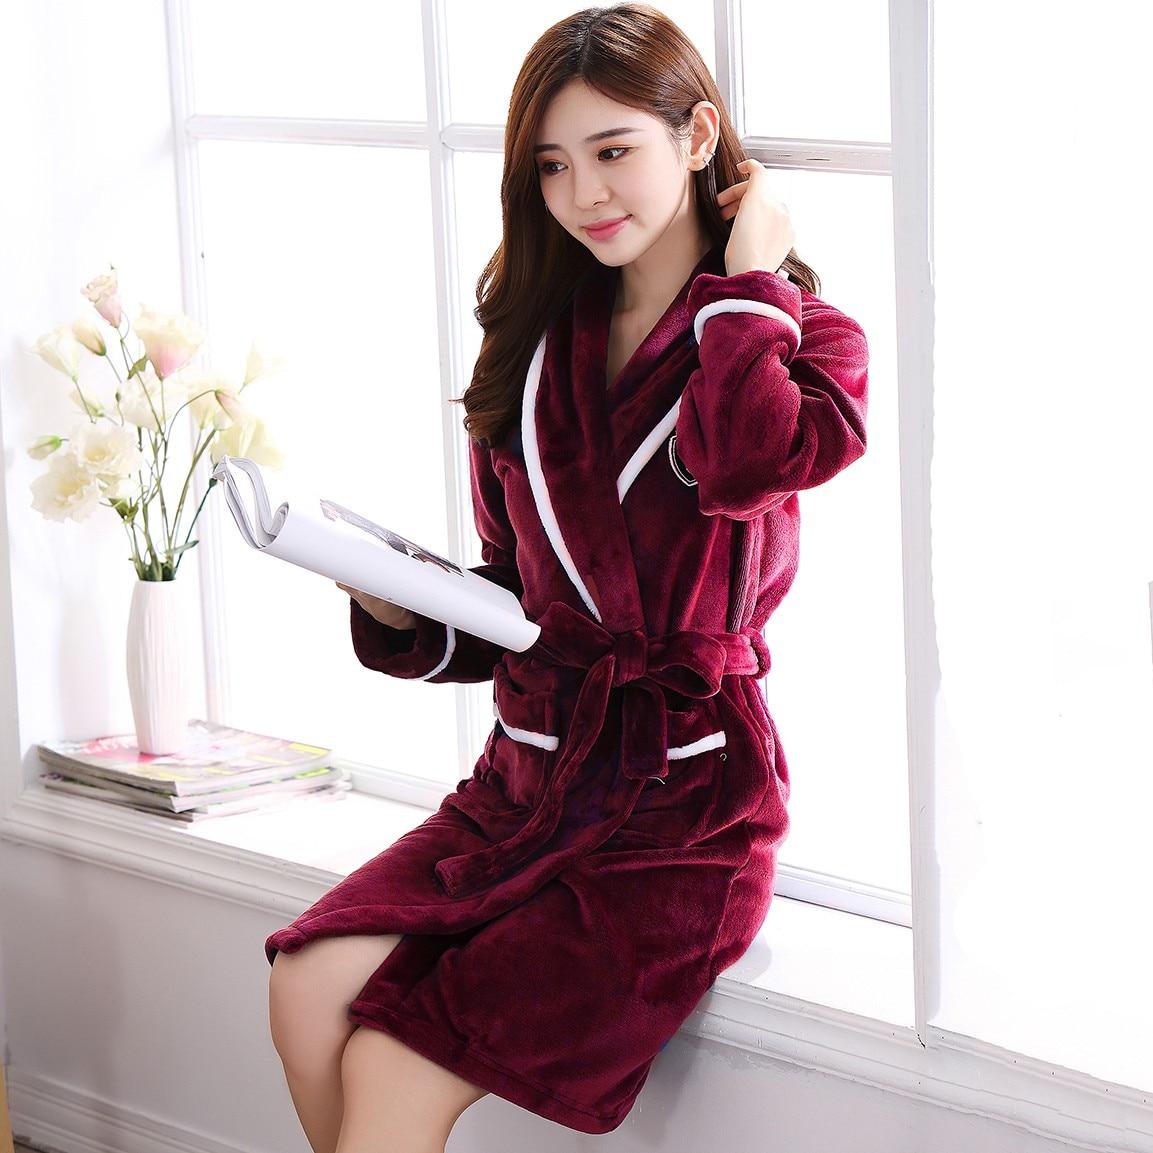 Women Nightdress Coral Fleece Sleepwear Winter Warm Kimono Robe Gown Plus Size 3XL Intimate Lingerie Thick Bathrobe Home Clothes